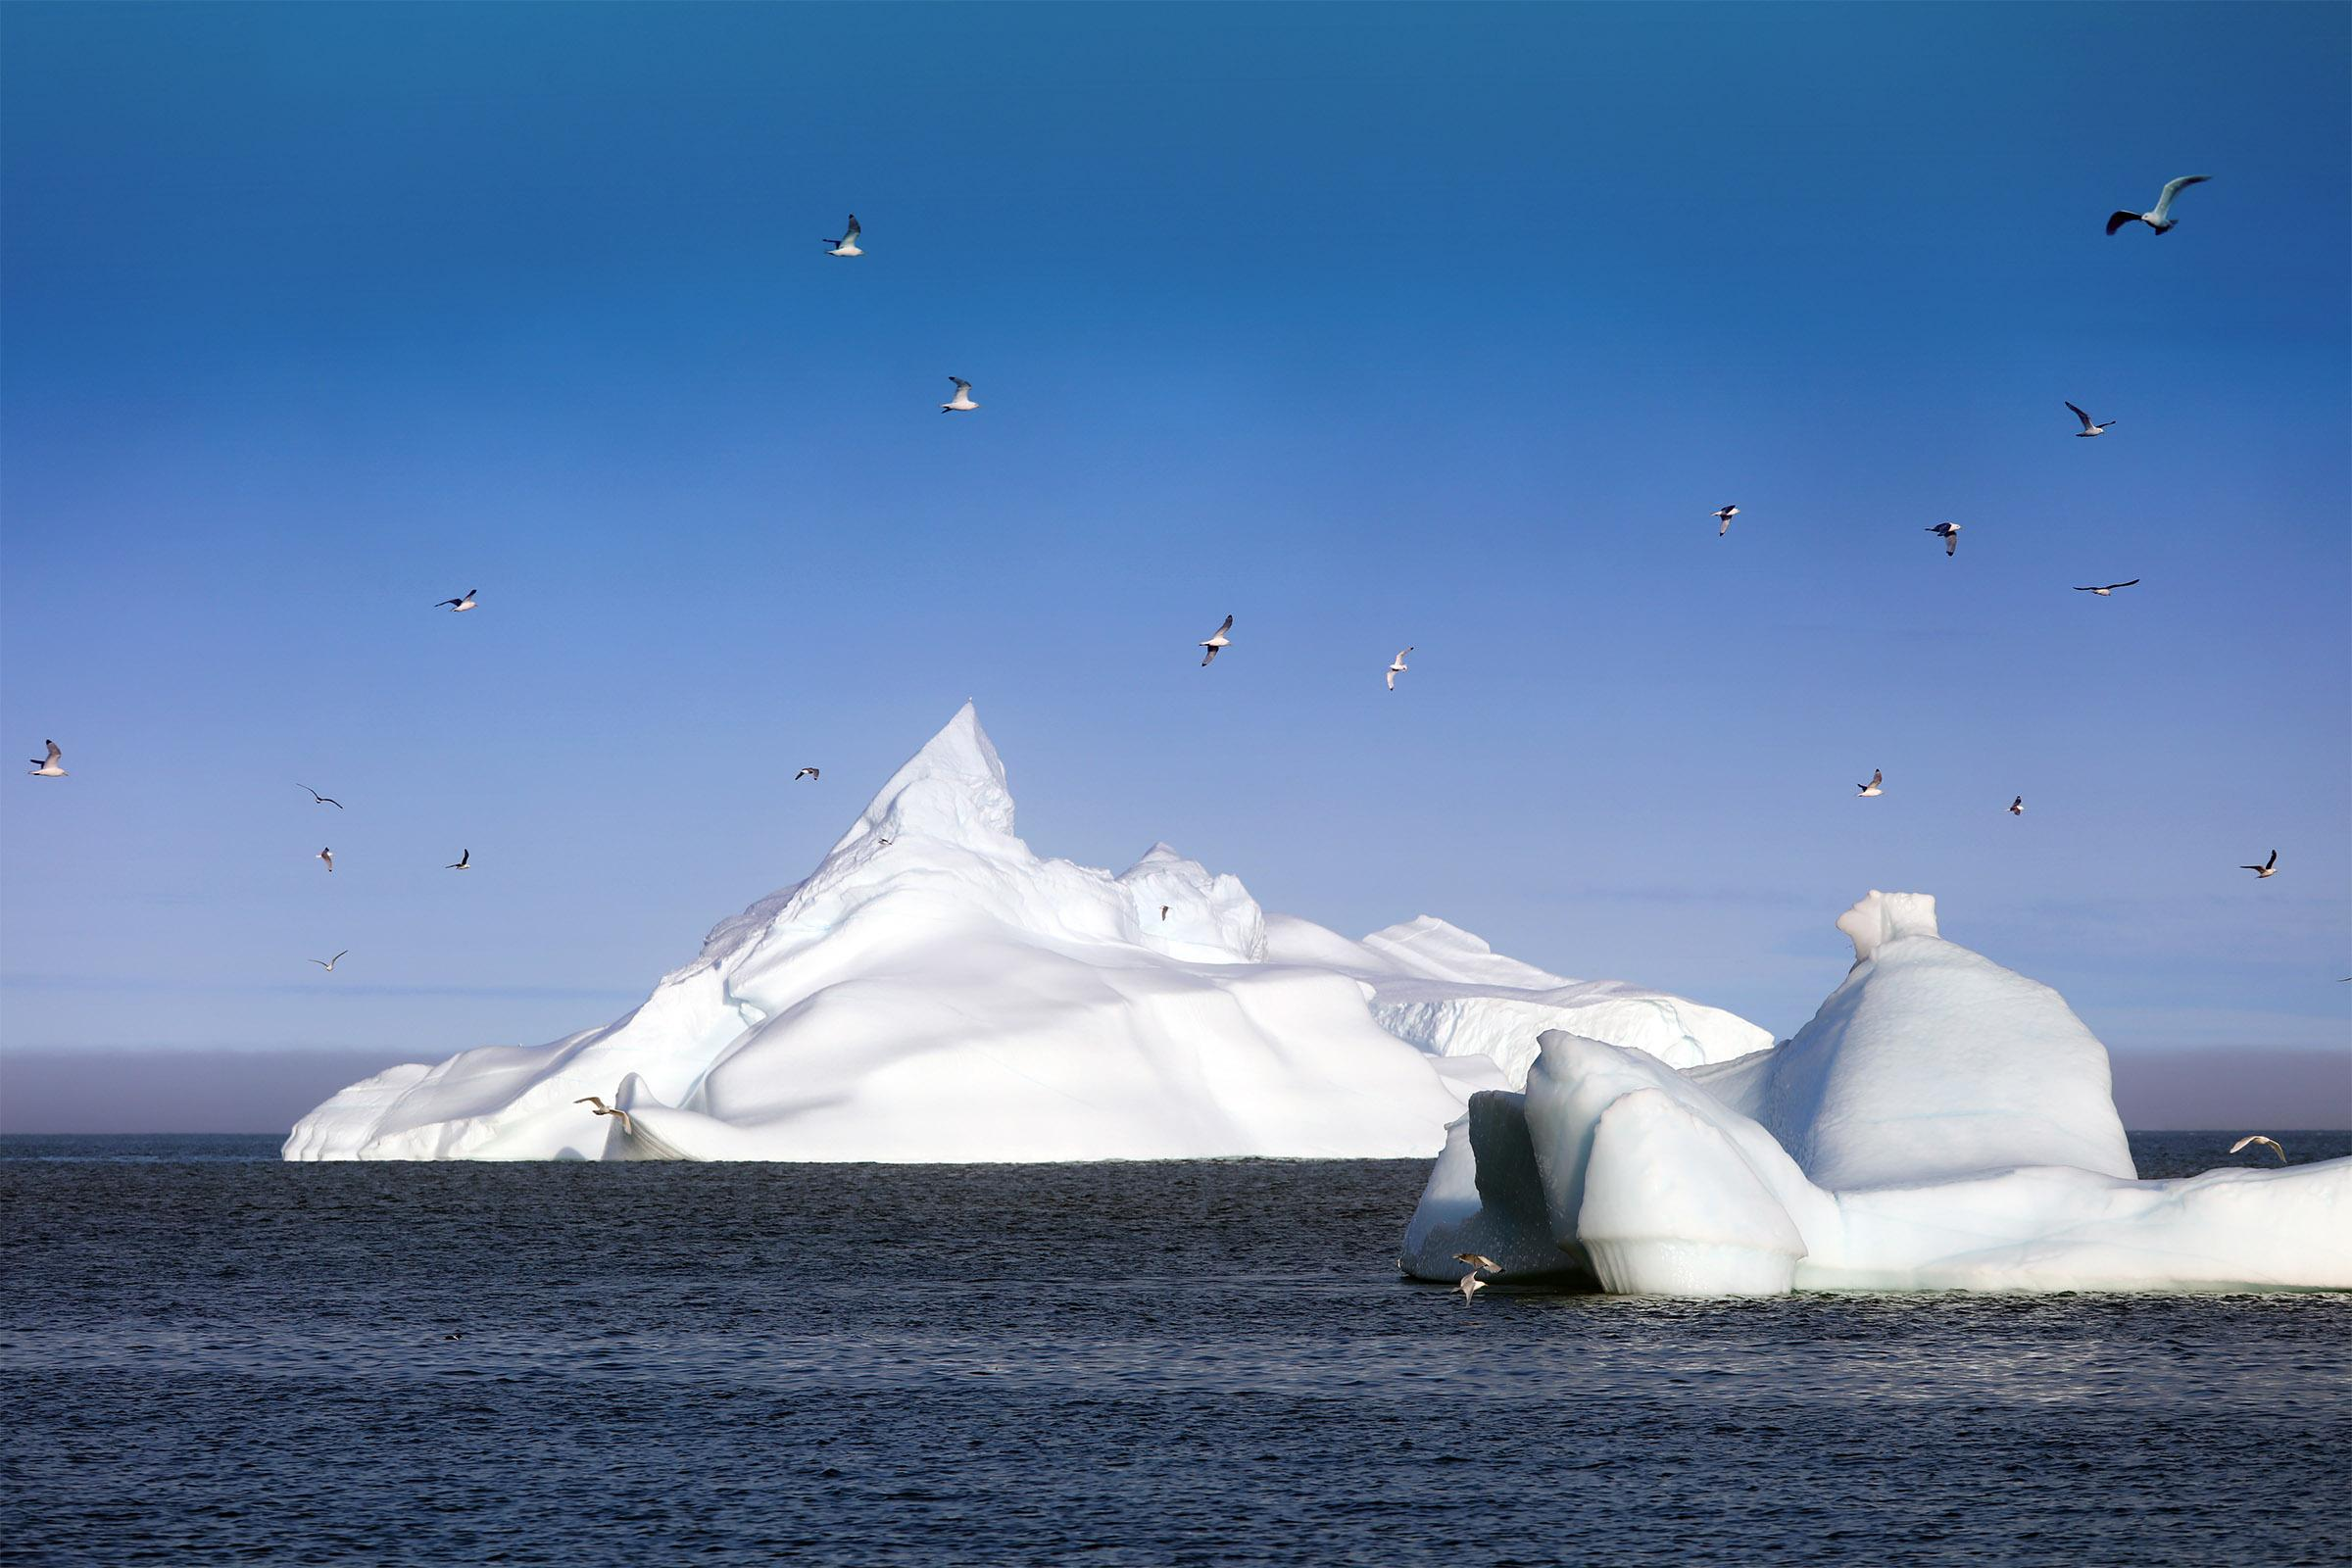 Birds flying over floating icebergs in Disko Bay in Greenland. Photo by Jurga Rubinovaite.